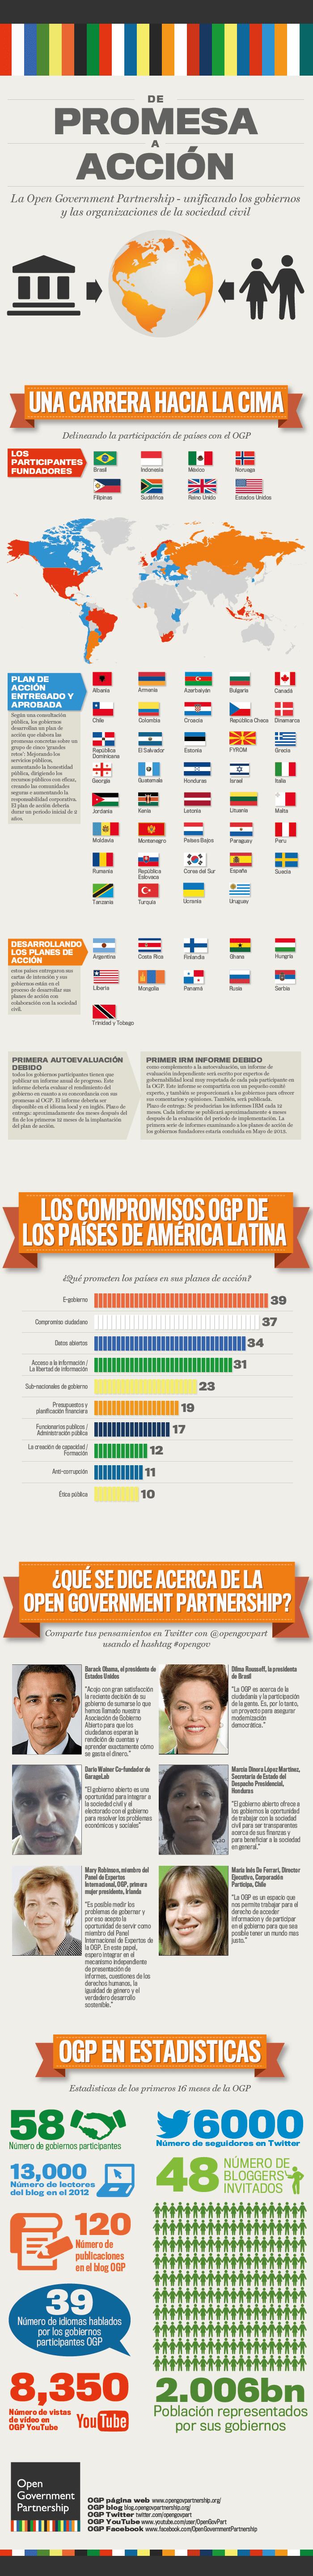 América Latina y la Open Government Partnership [INFOGRAPHIC]